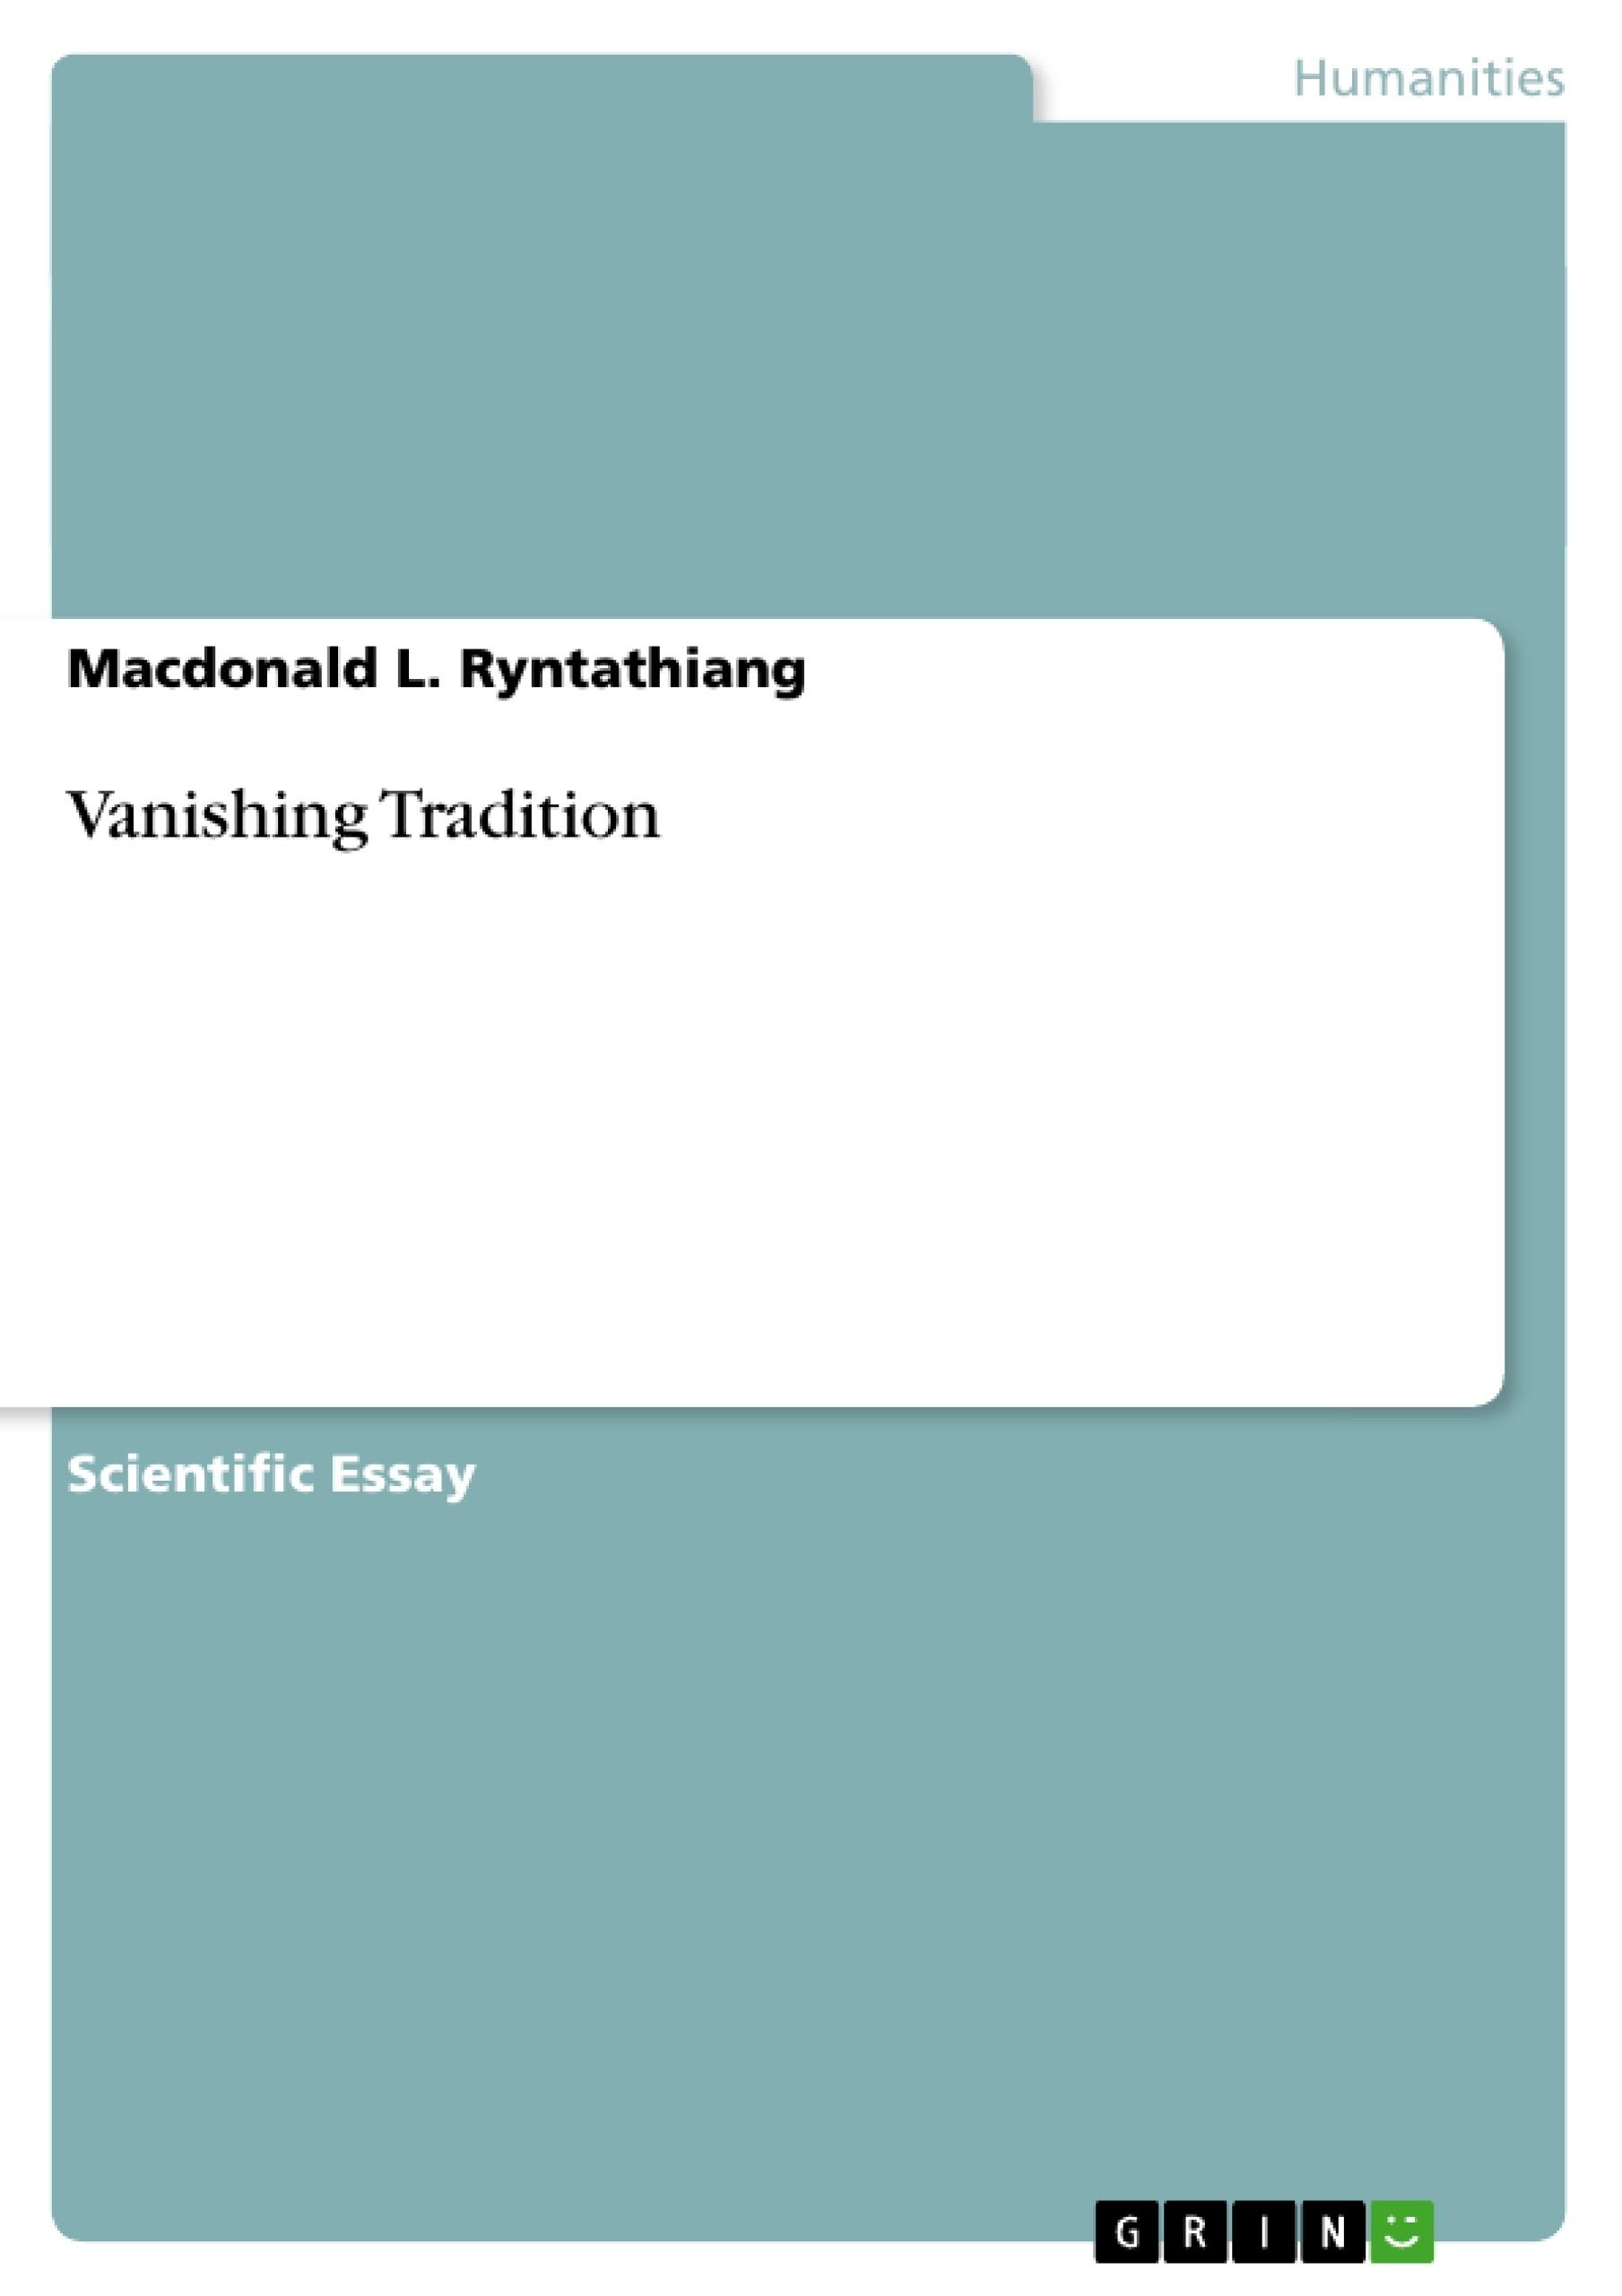 GRIN - Vanishing Tradition